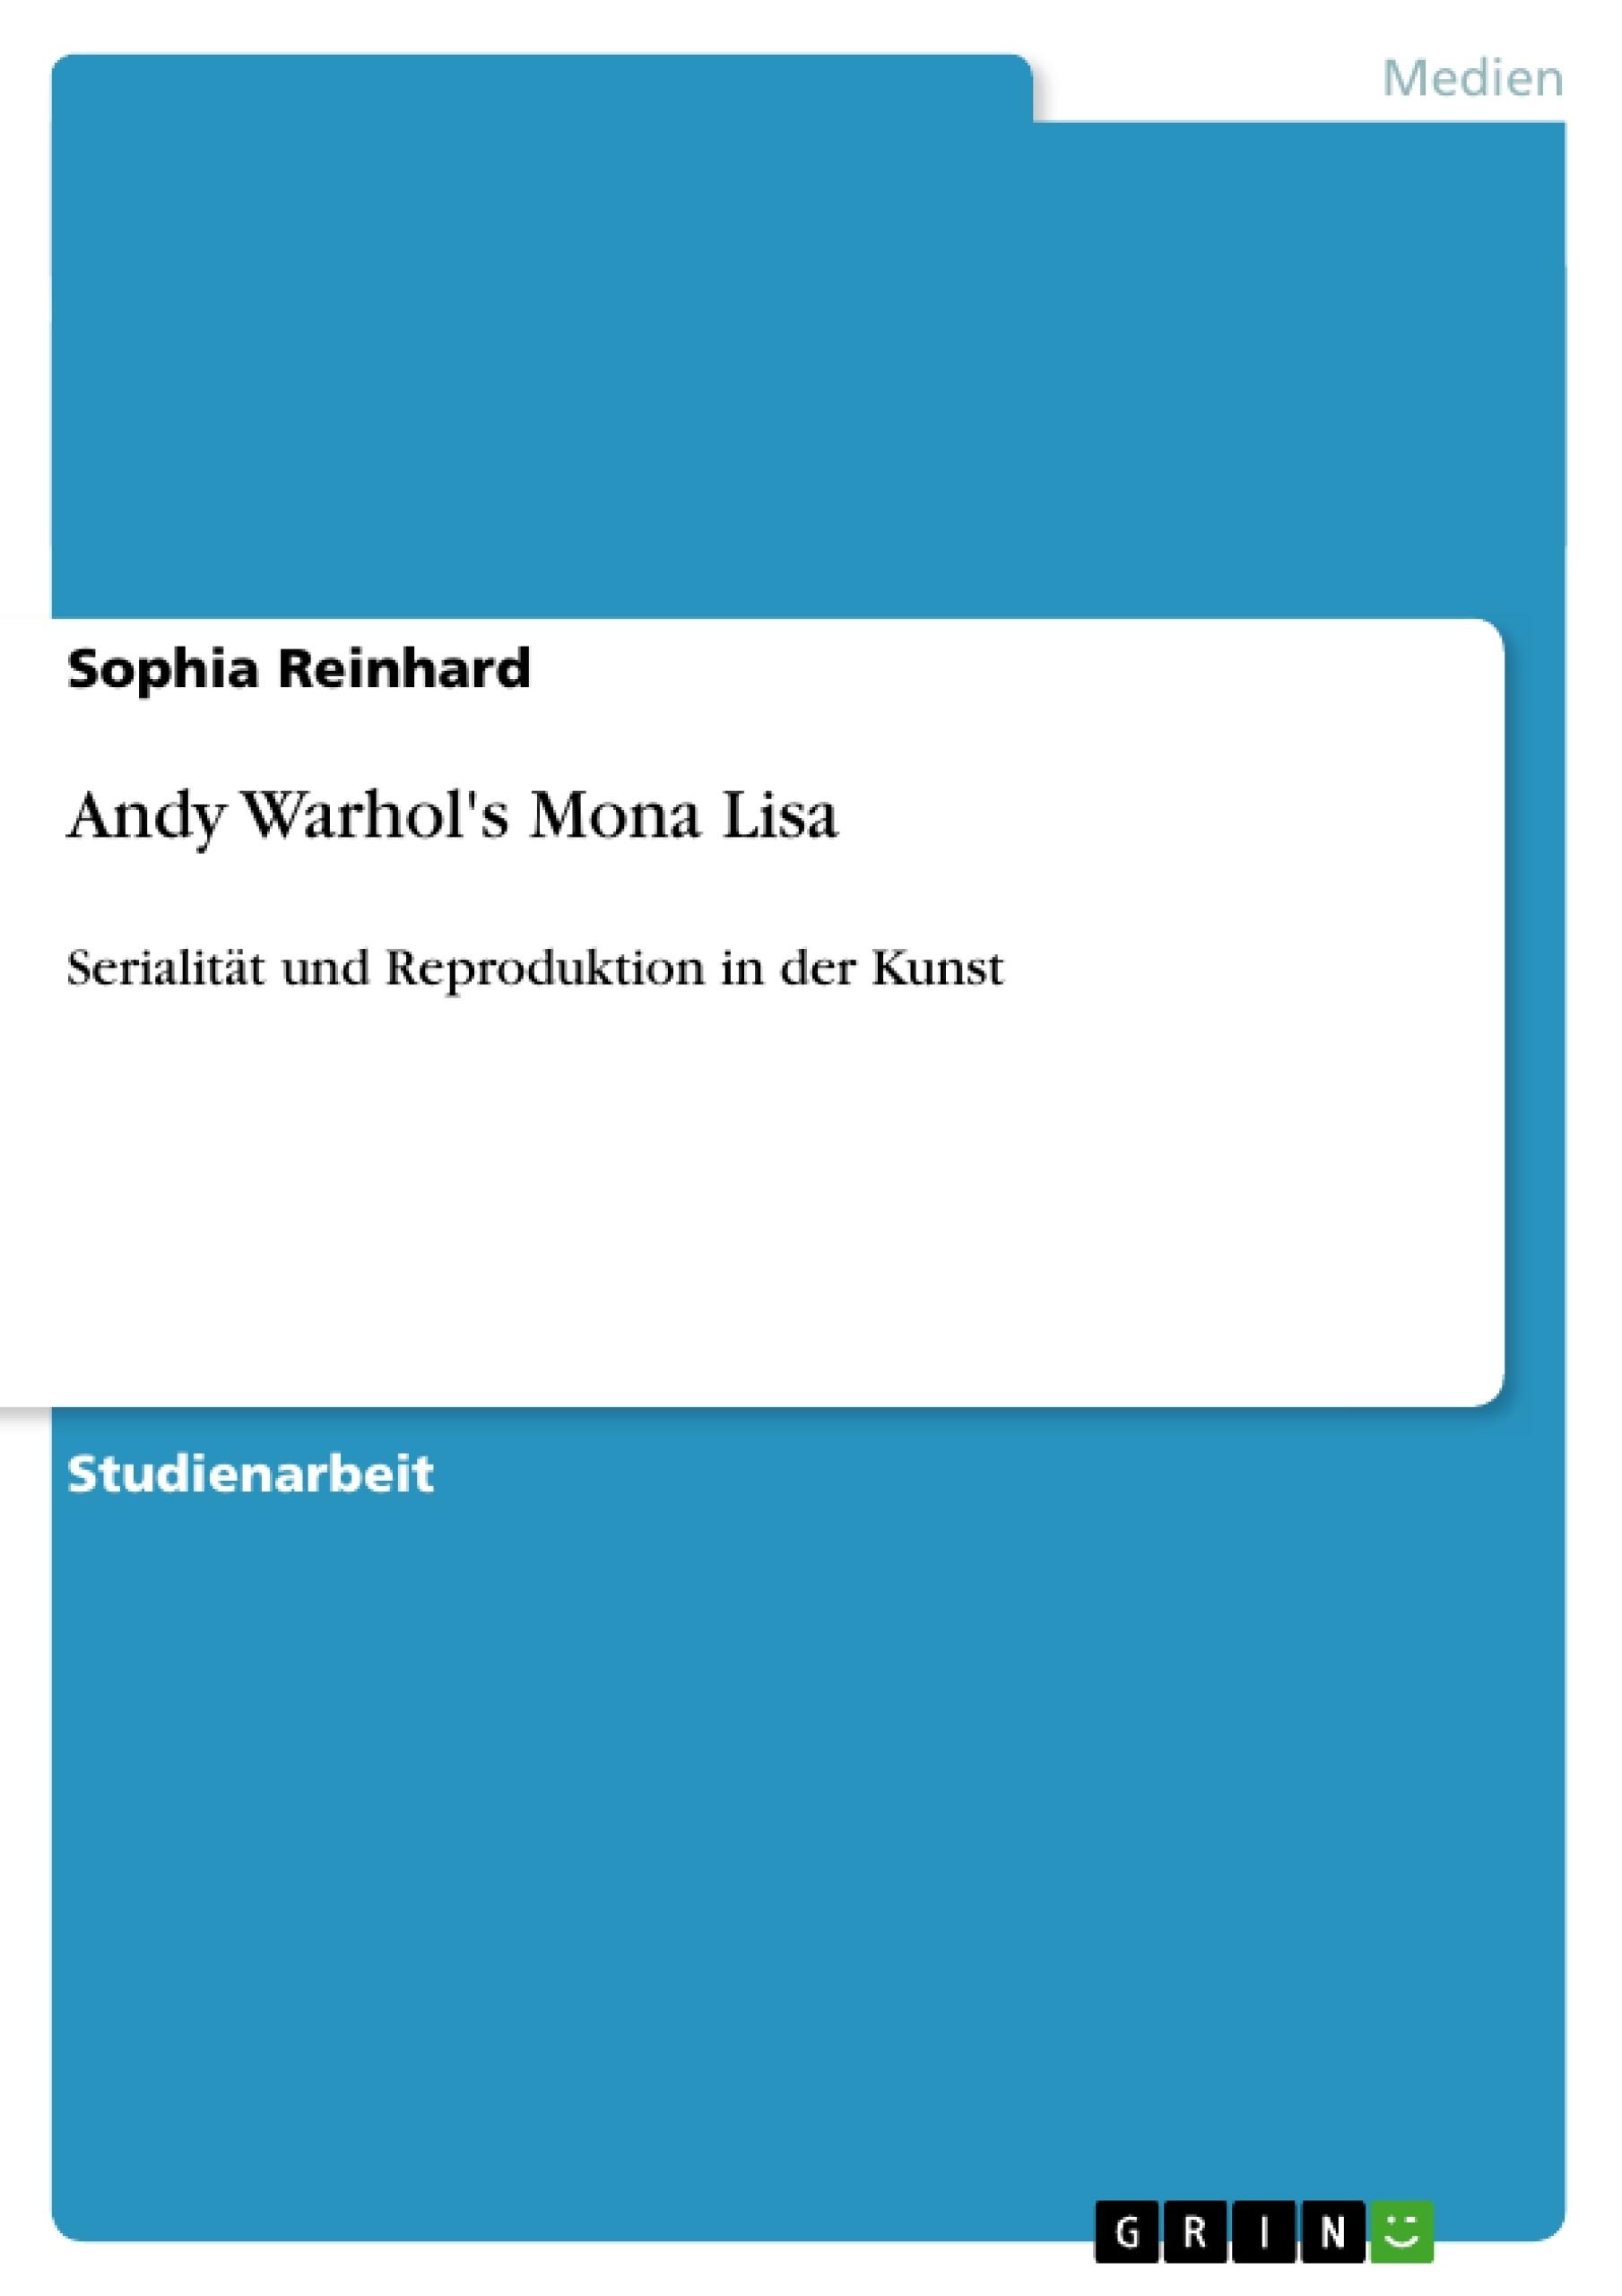 Titel: Andy Warhol's Mona Lisa